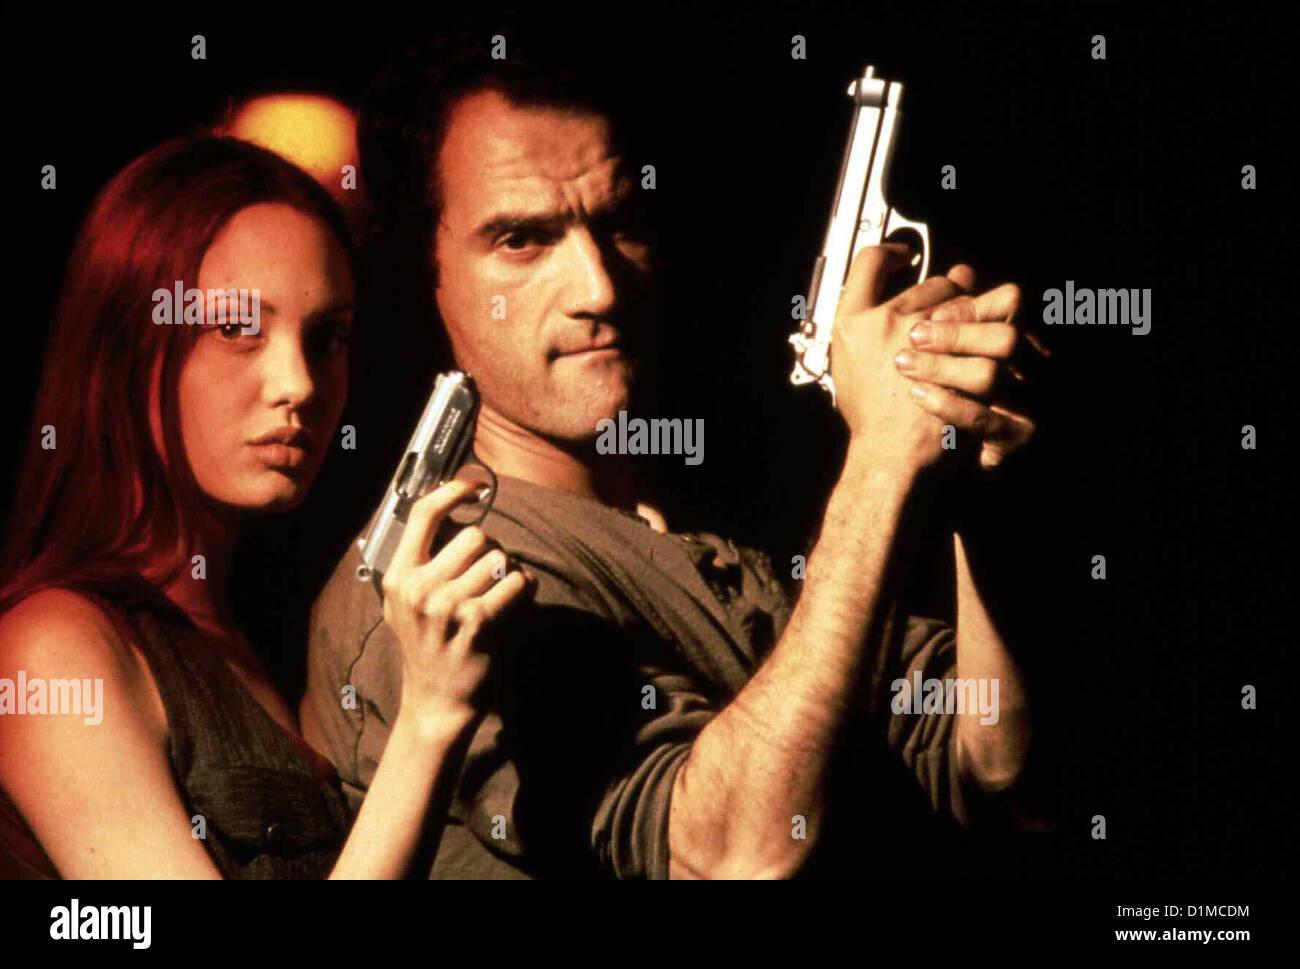 Angelina Jolie Cyborg 2 1993 cyborg 2 stock photos & cyborg 2 stock images - alamy